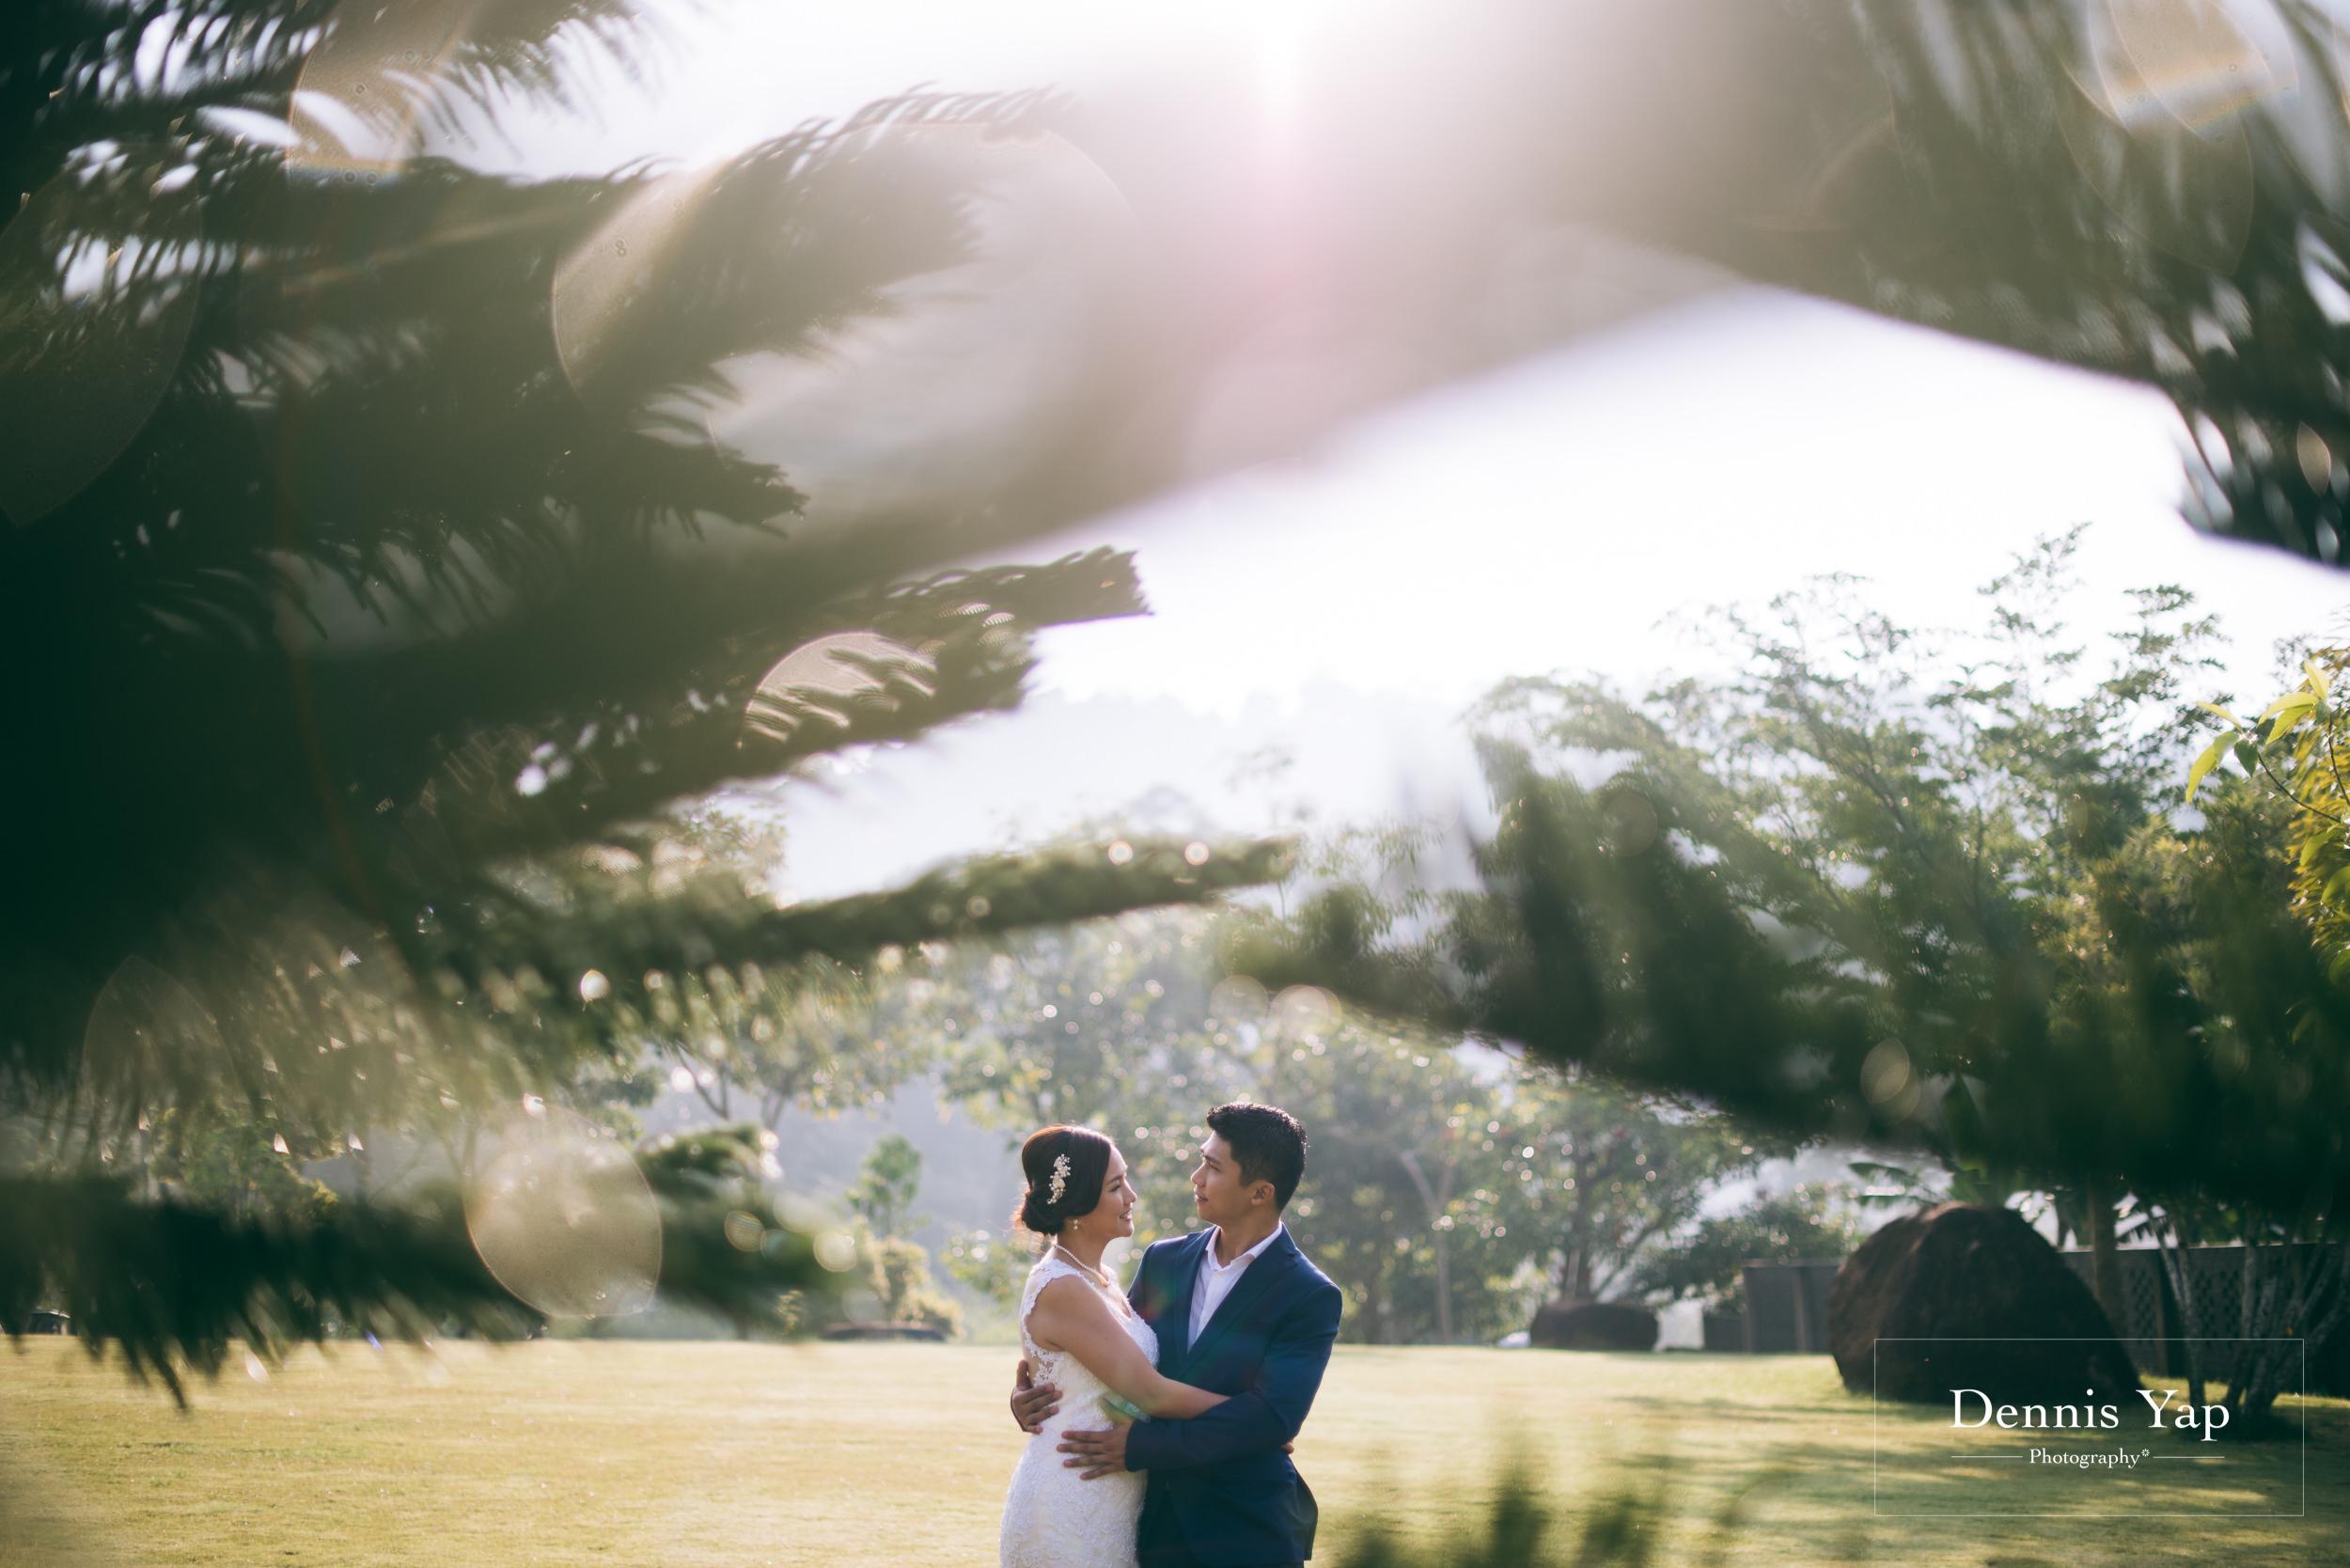 jung munn yein prewedding baby family dennis yap photography janda baik-6.jpg